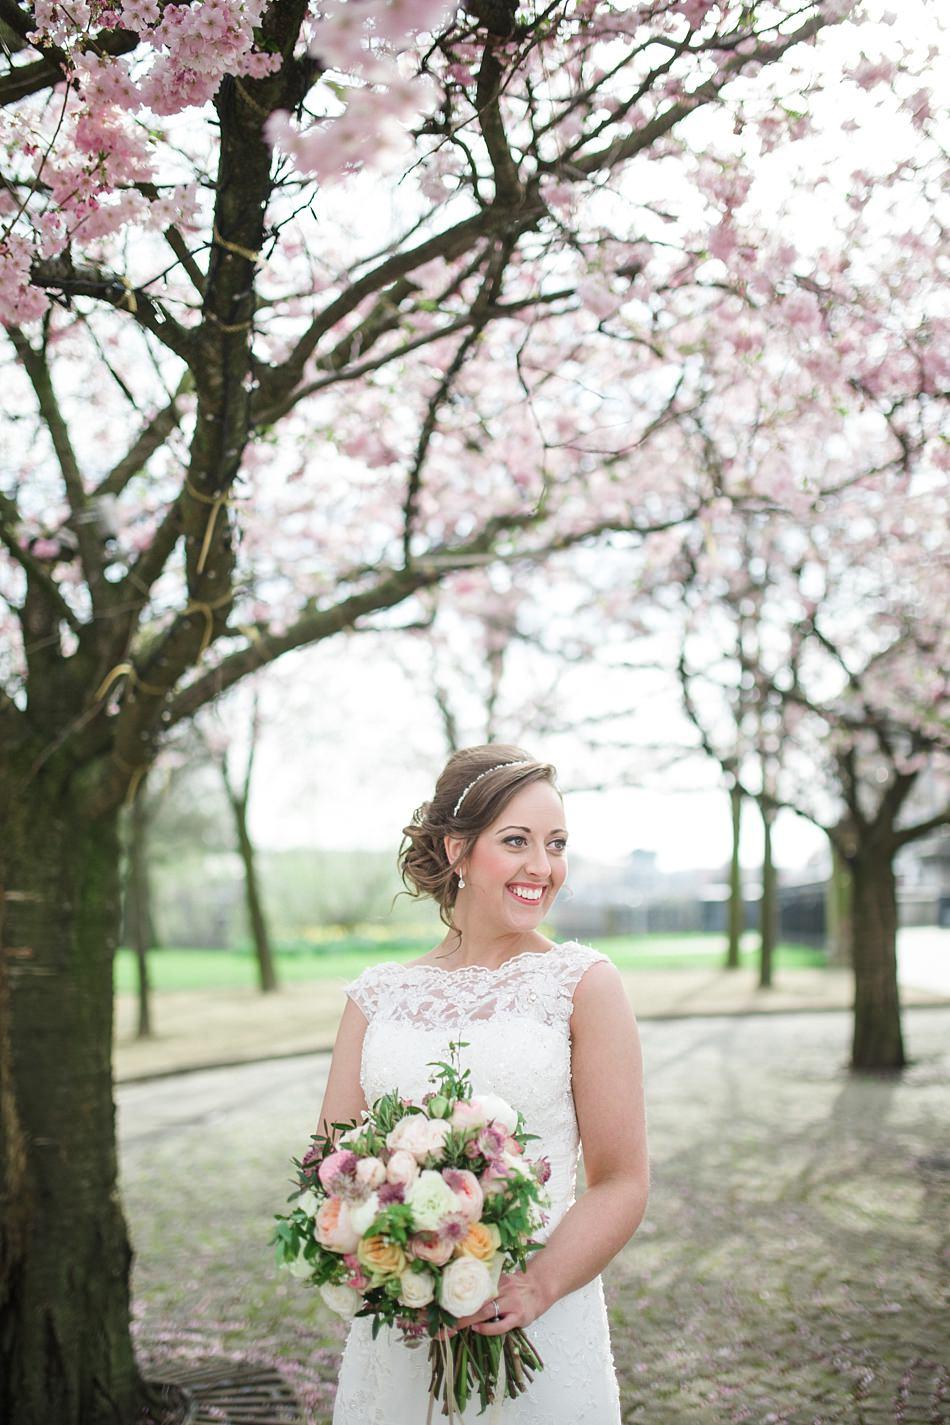 fine art wedding photographers glasgow scotland 9-4.jpg